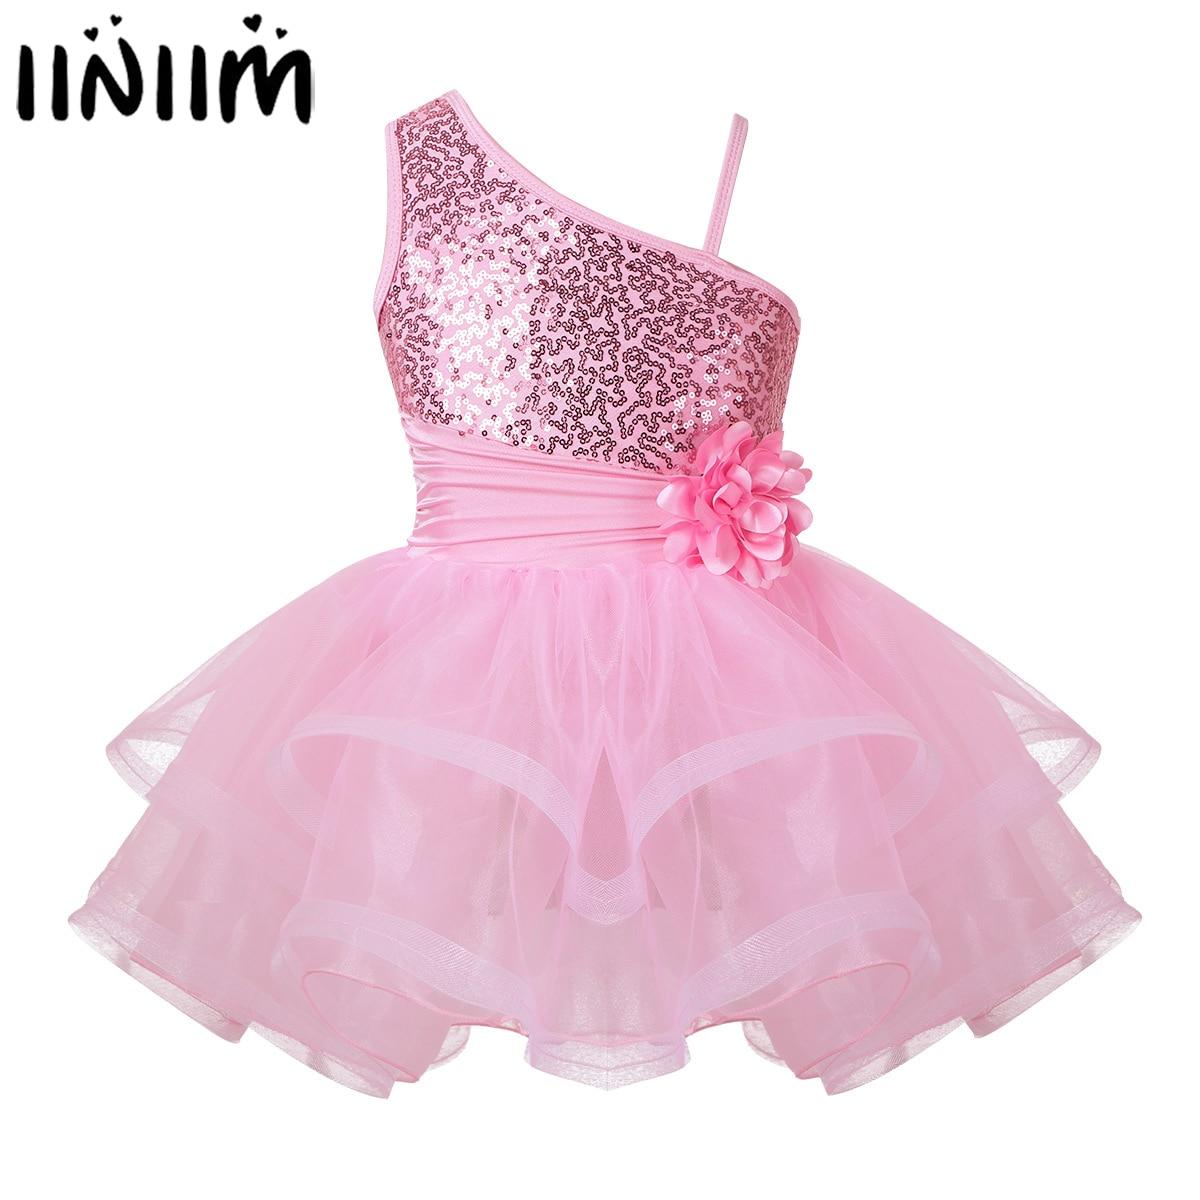 iiniim Kids Girls Ballerina Dance Dress One-Shoulder Sequins Contemporary Dance Costumes Dancewear Gymnastics Leotard Tutu Dress